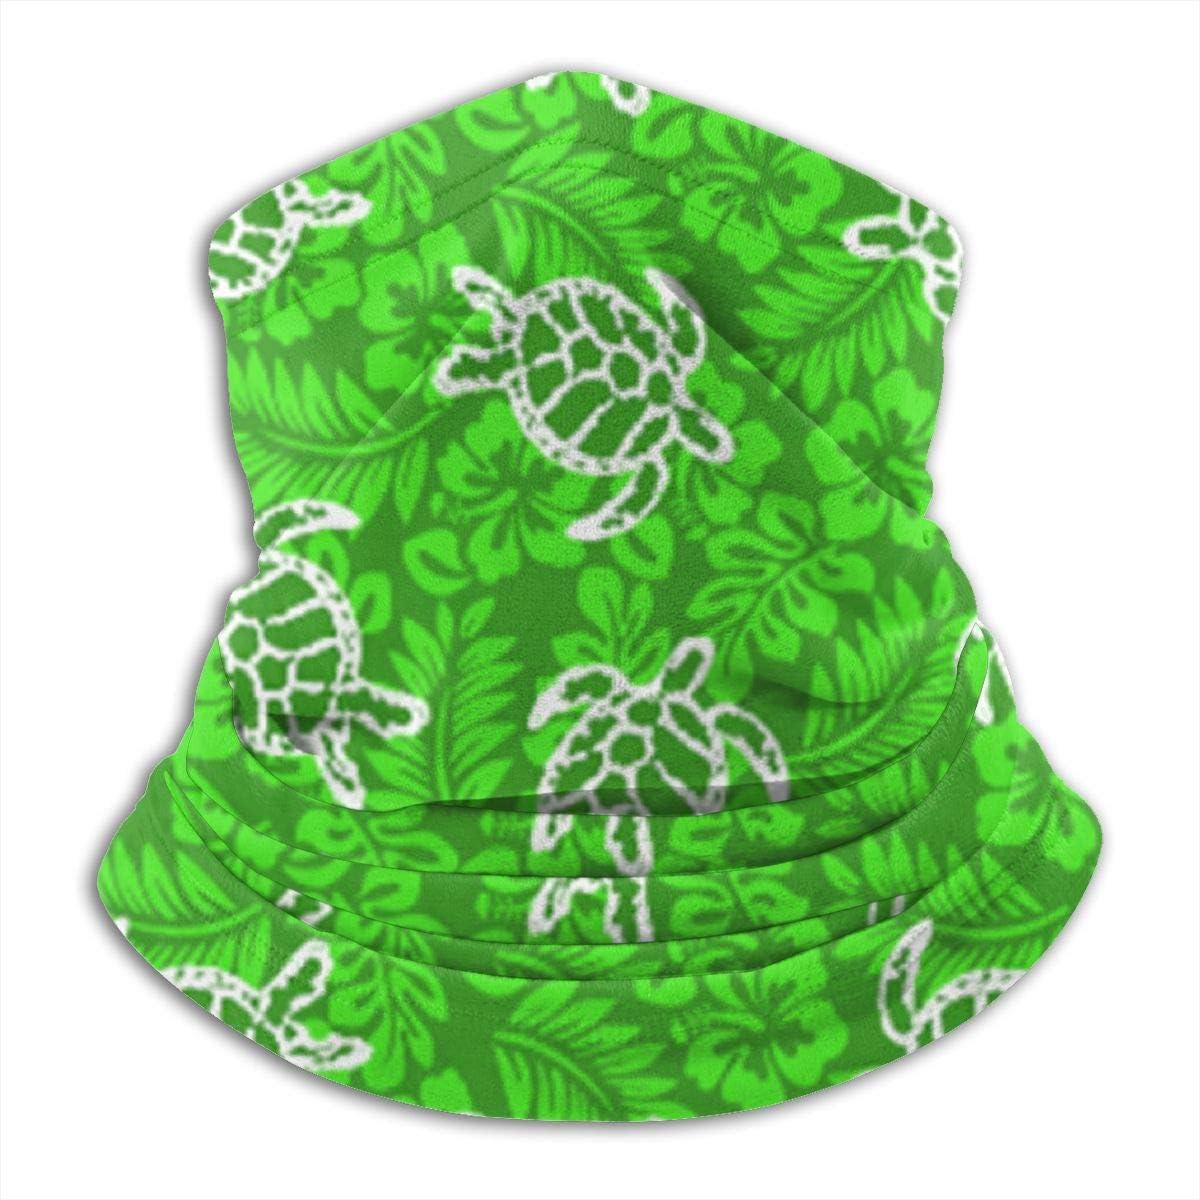 Hot Sea Turtle Hawaiian Summer Surf Fleece Neck Warmer - Reversible Neck Gaiter Tube, Versatility Ear Warmer Headband & Mask For Men And Women